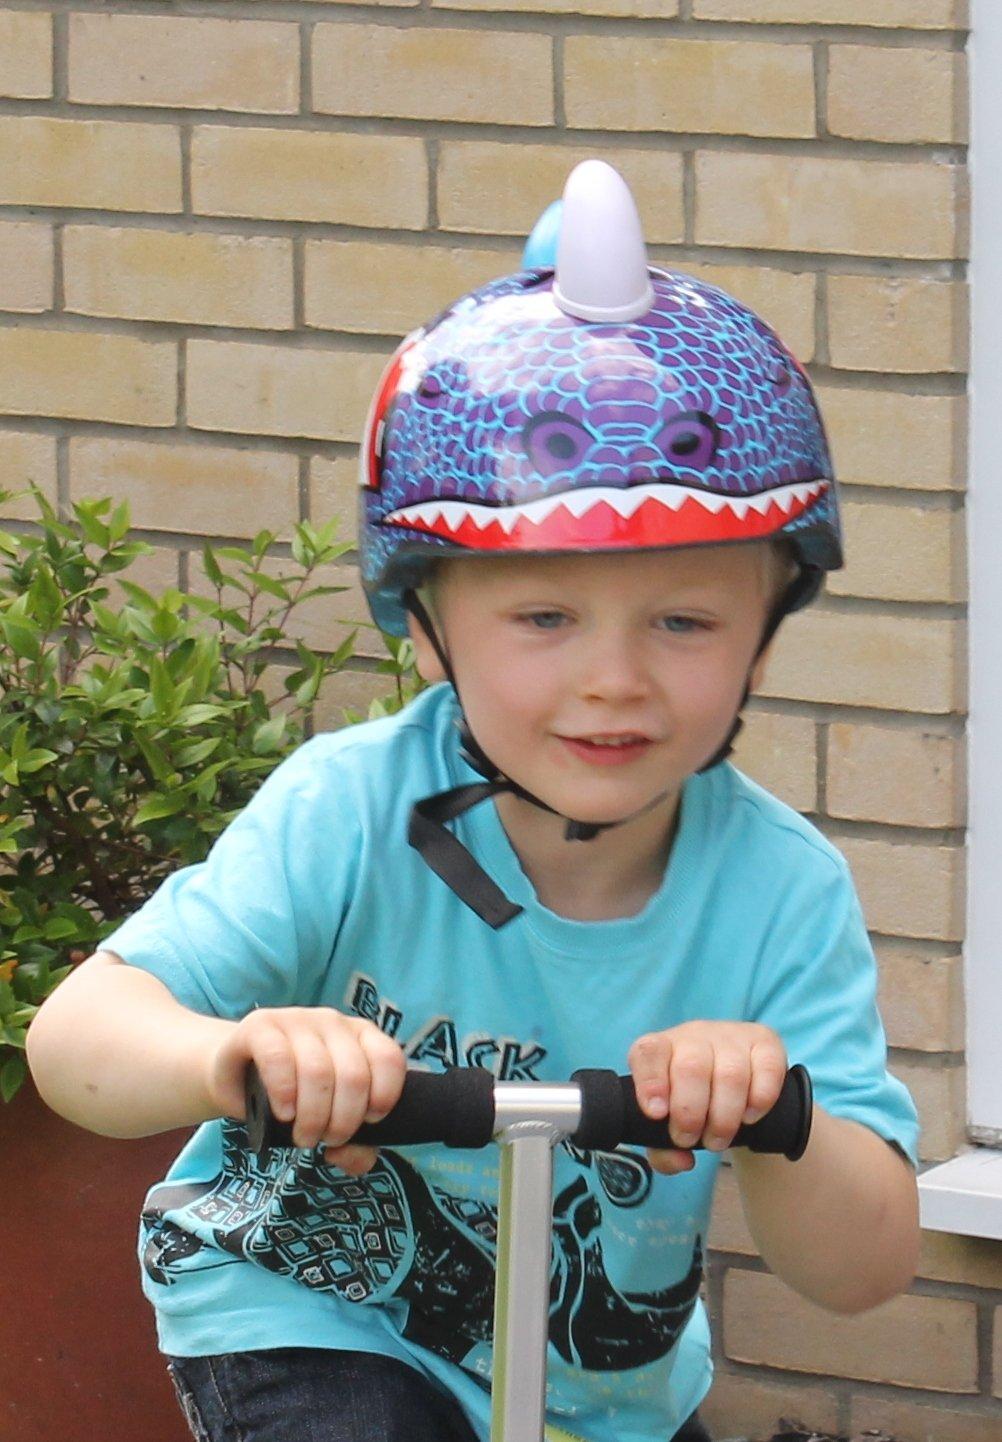 Dinosaur Safety Helmet Cycling Skating Scooter Bike